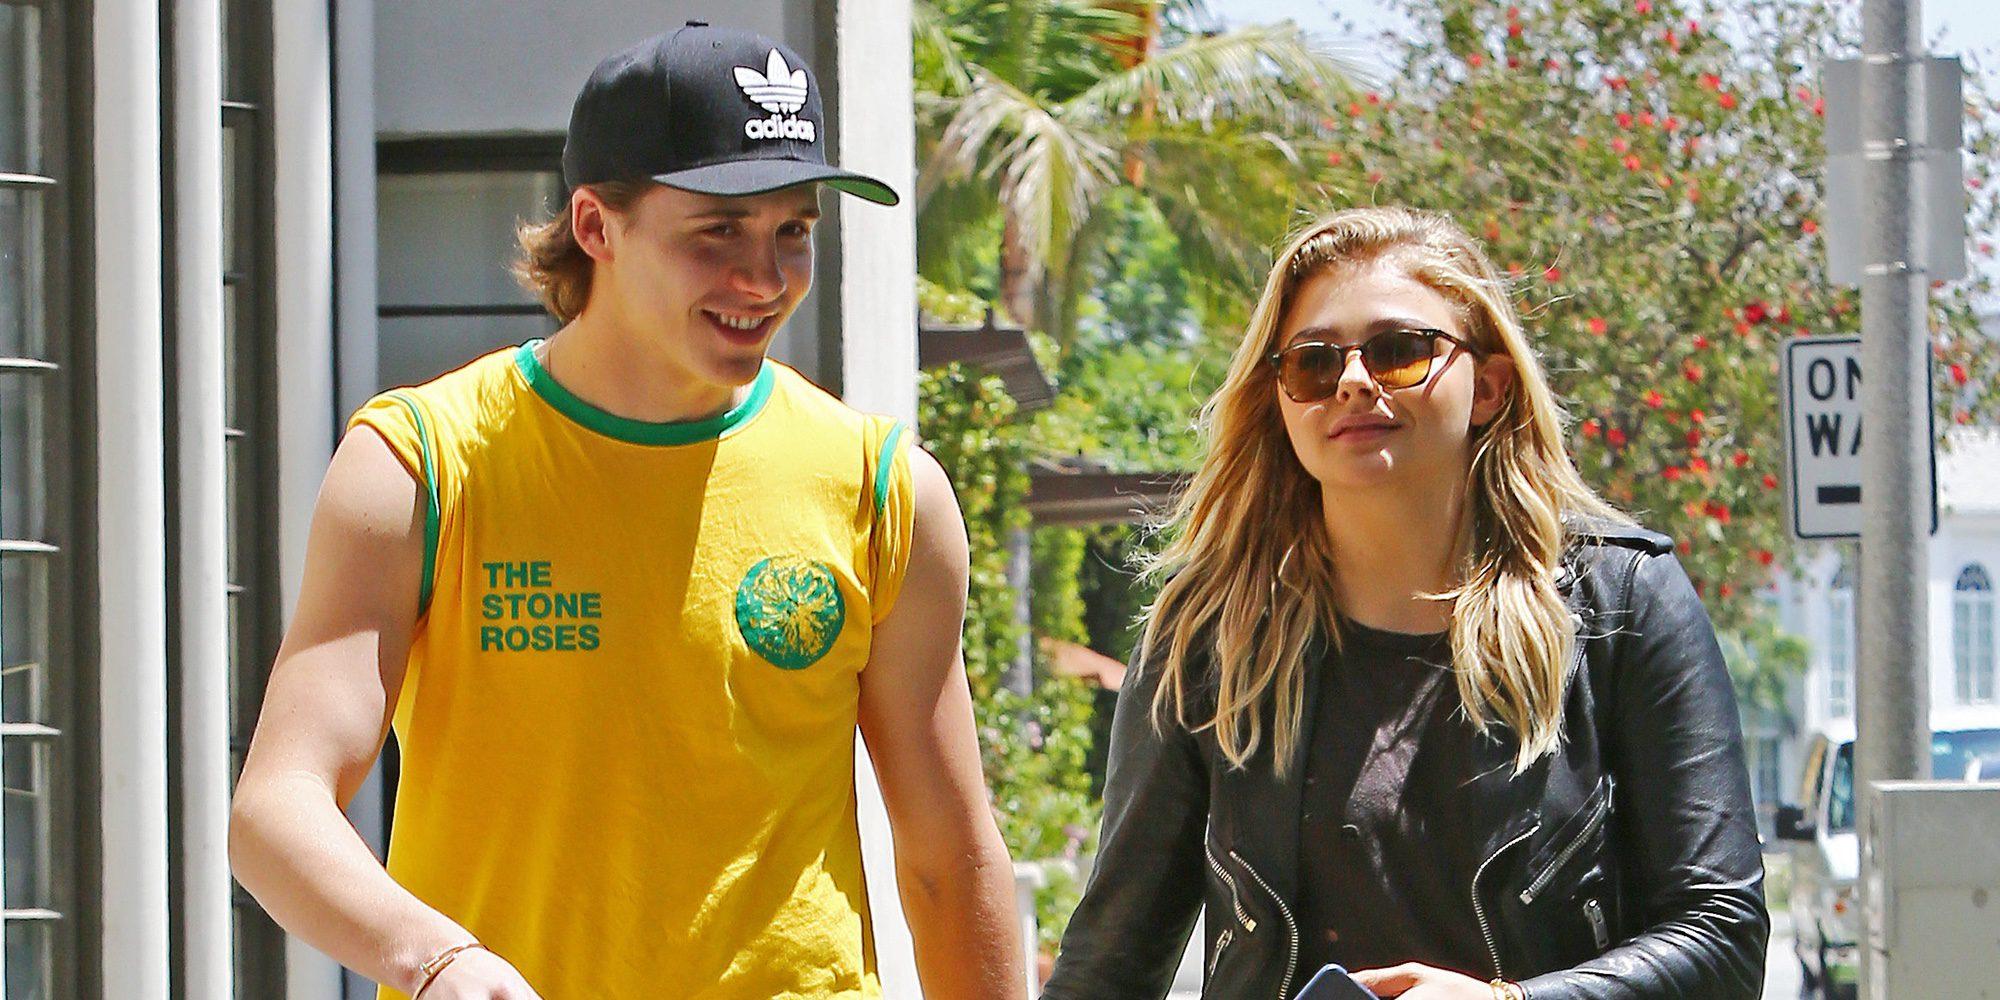 Chloe Moretz y Brooklyn Beckham rompen su noviazgo